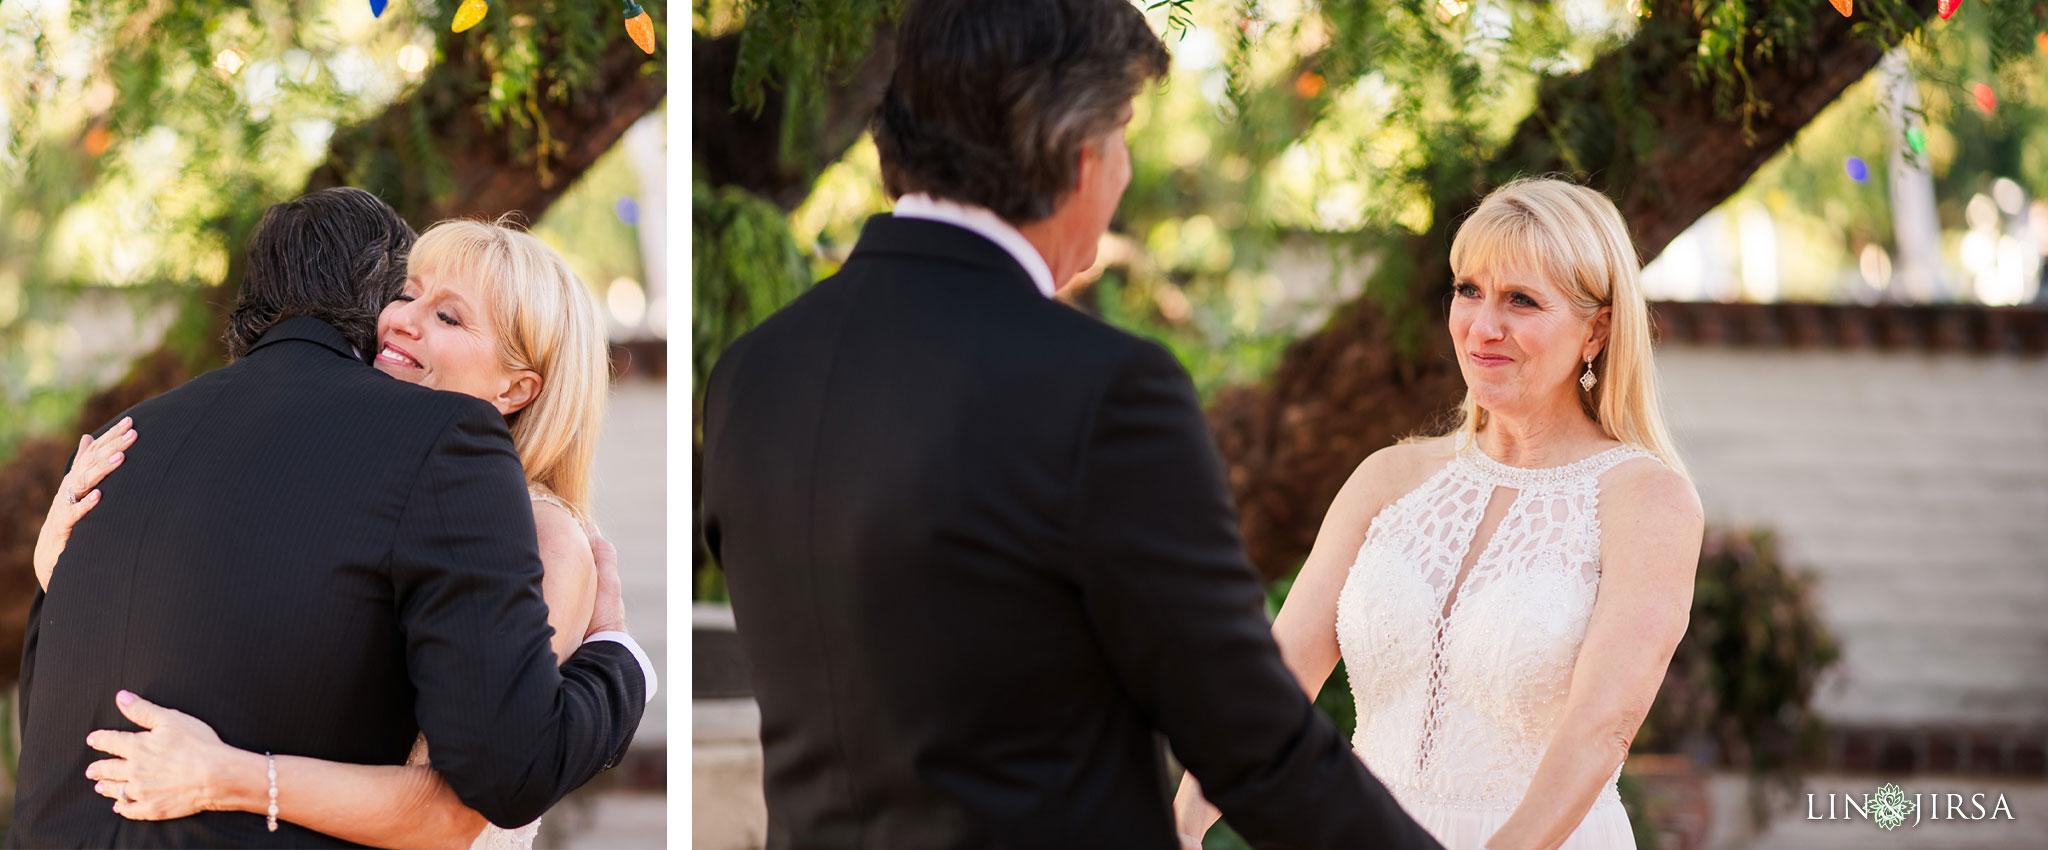 10 sherman library gardens orange county wedding photography